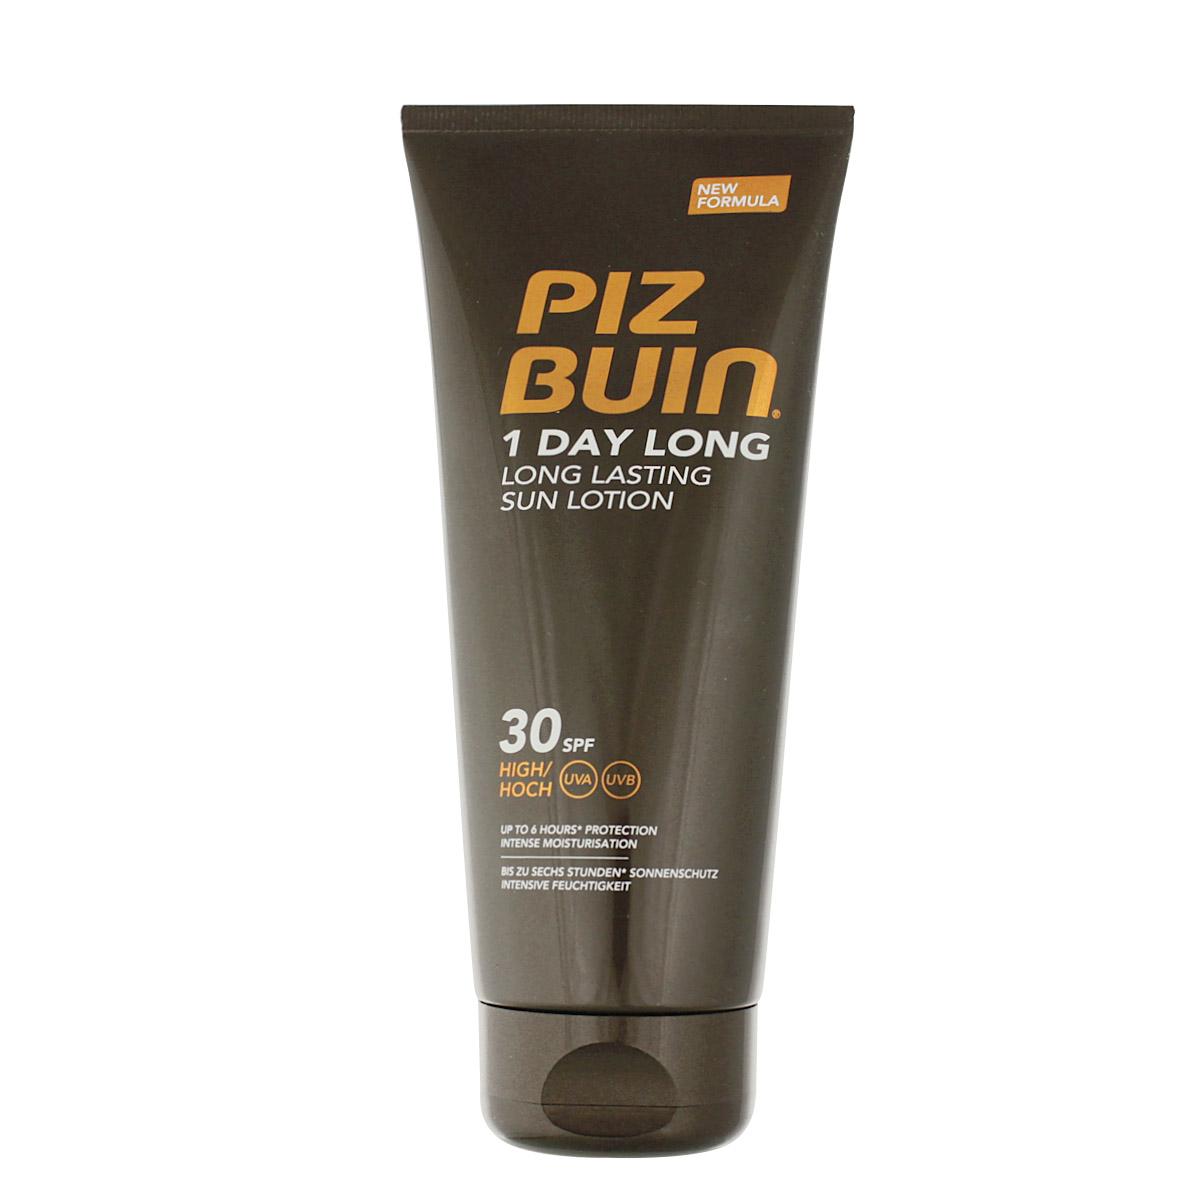 PizBuin 1 Day Long Lotion SPF 30 200 ml